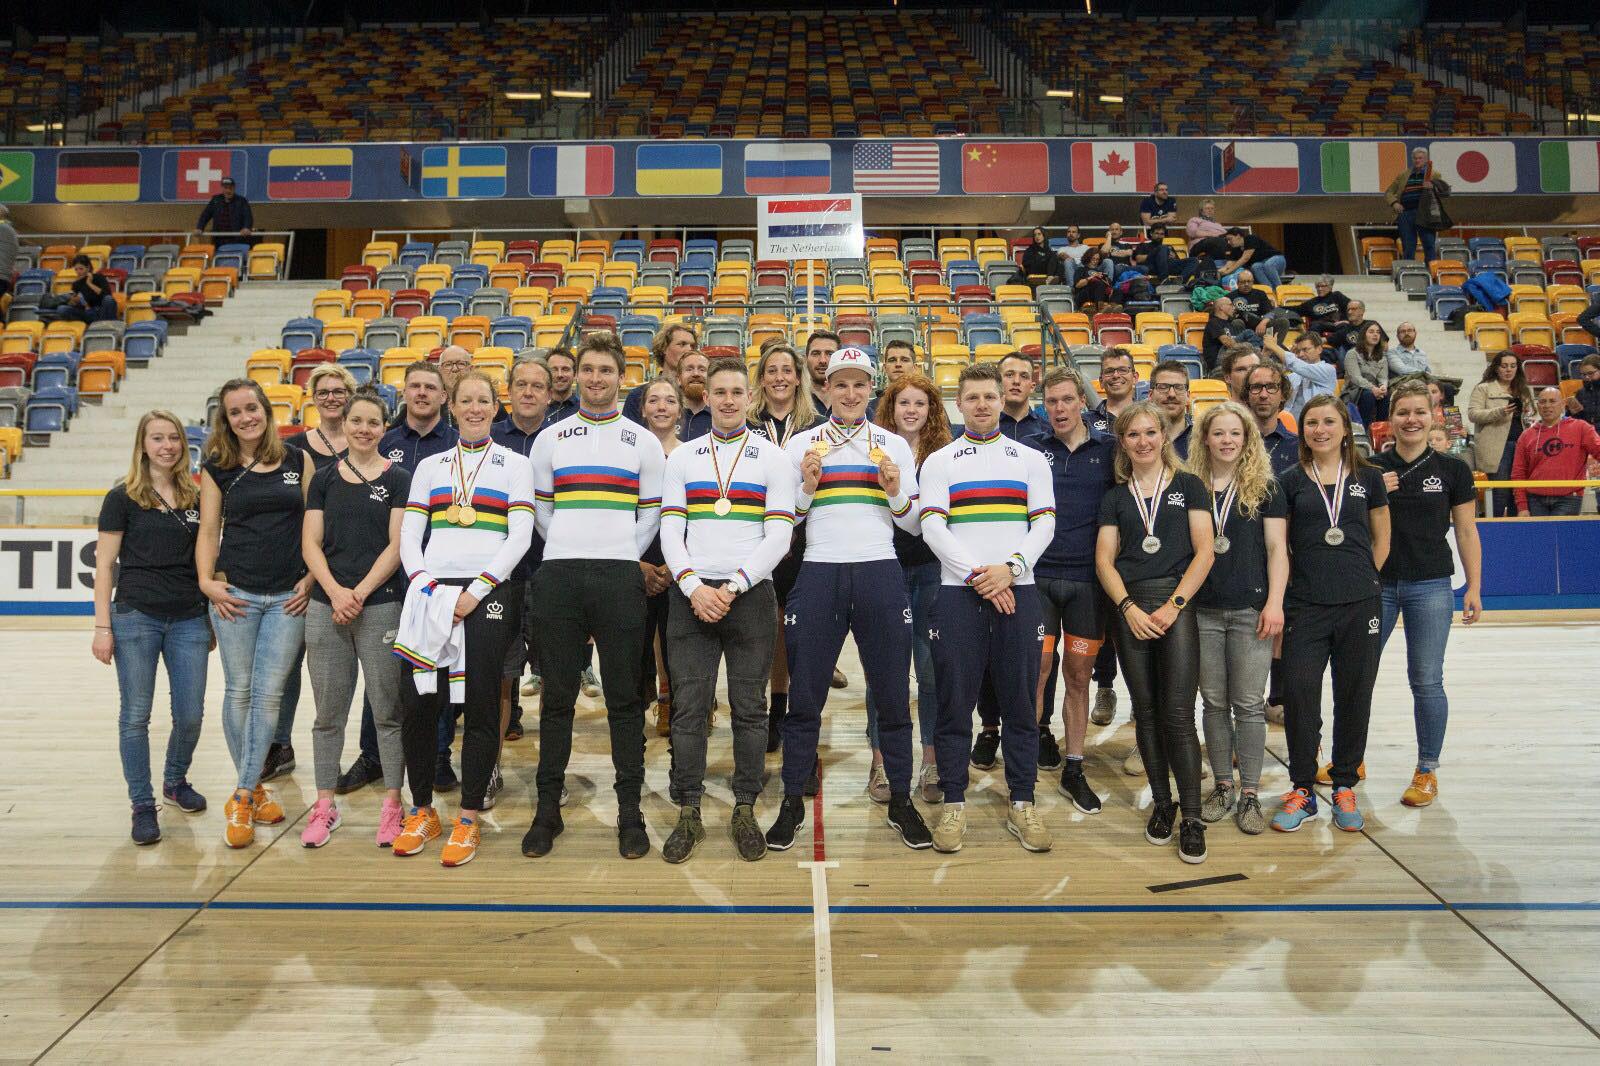 Renners + Crew World Championships 2018 Apeldoorn